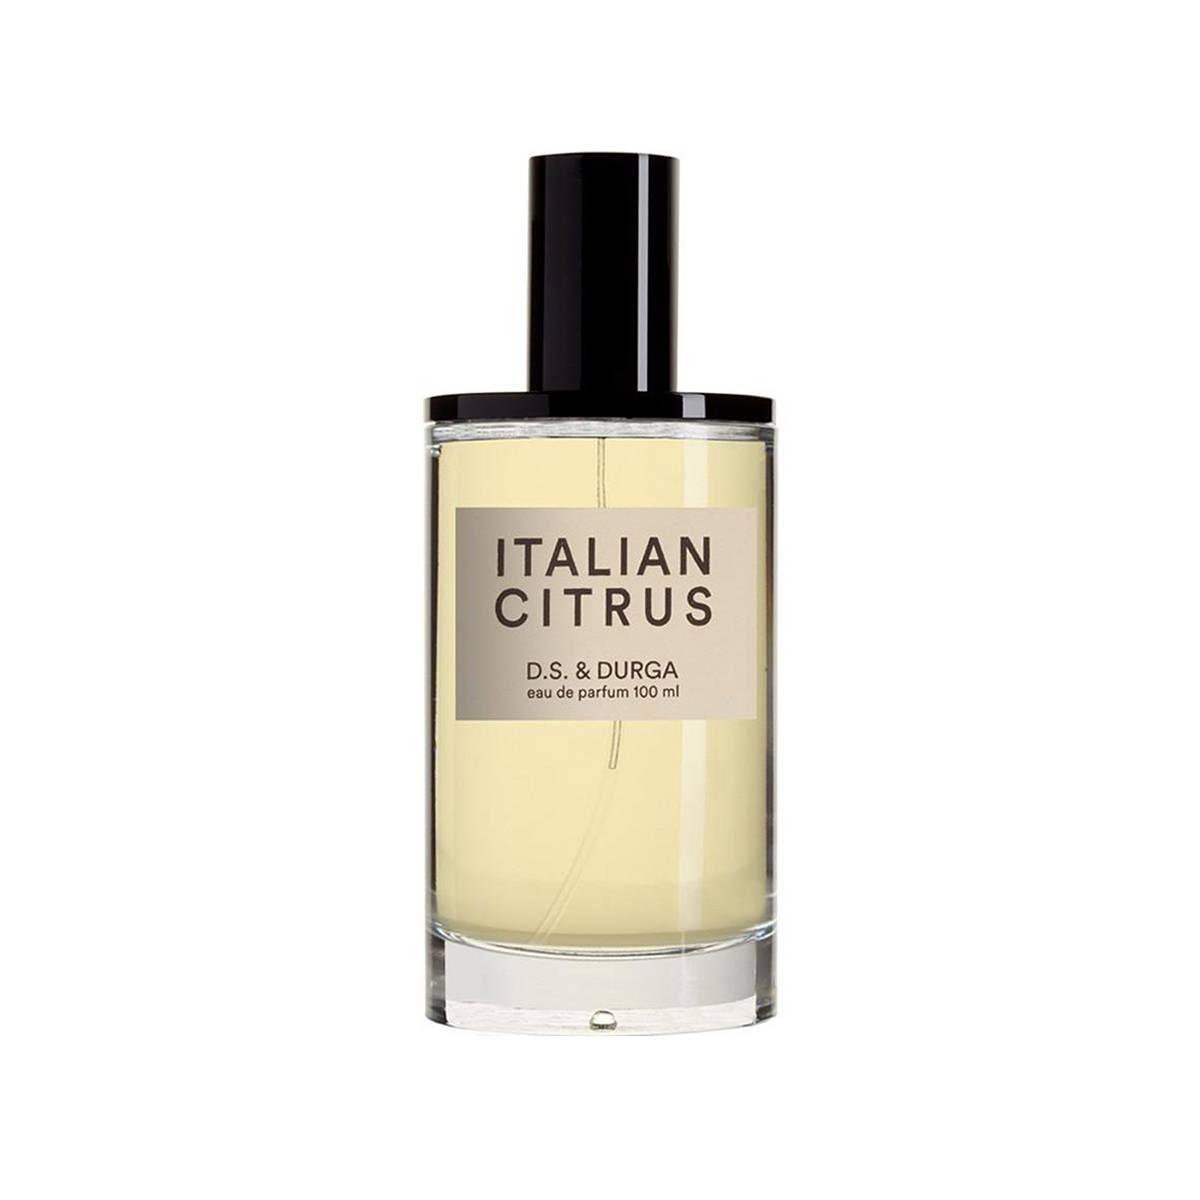 D.S. & Durga Italian Citrus Eau de Parfum